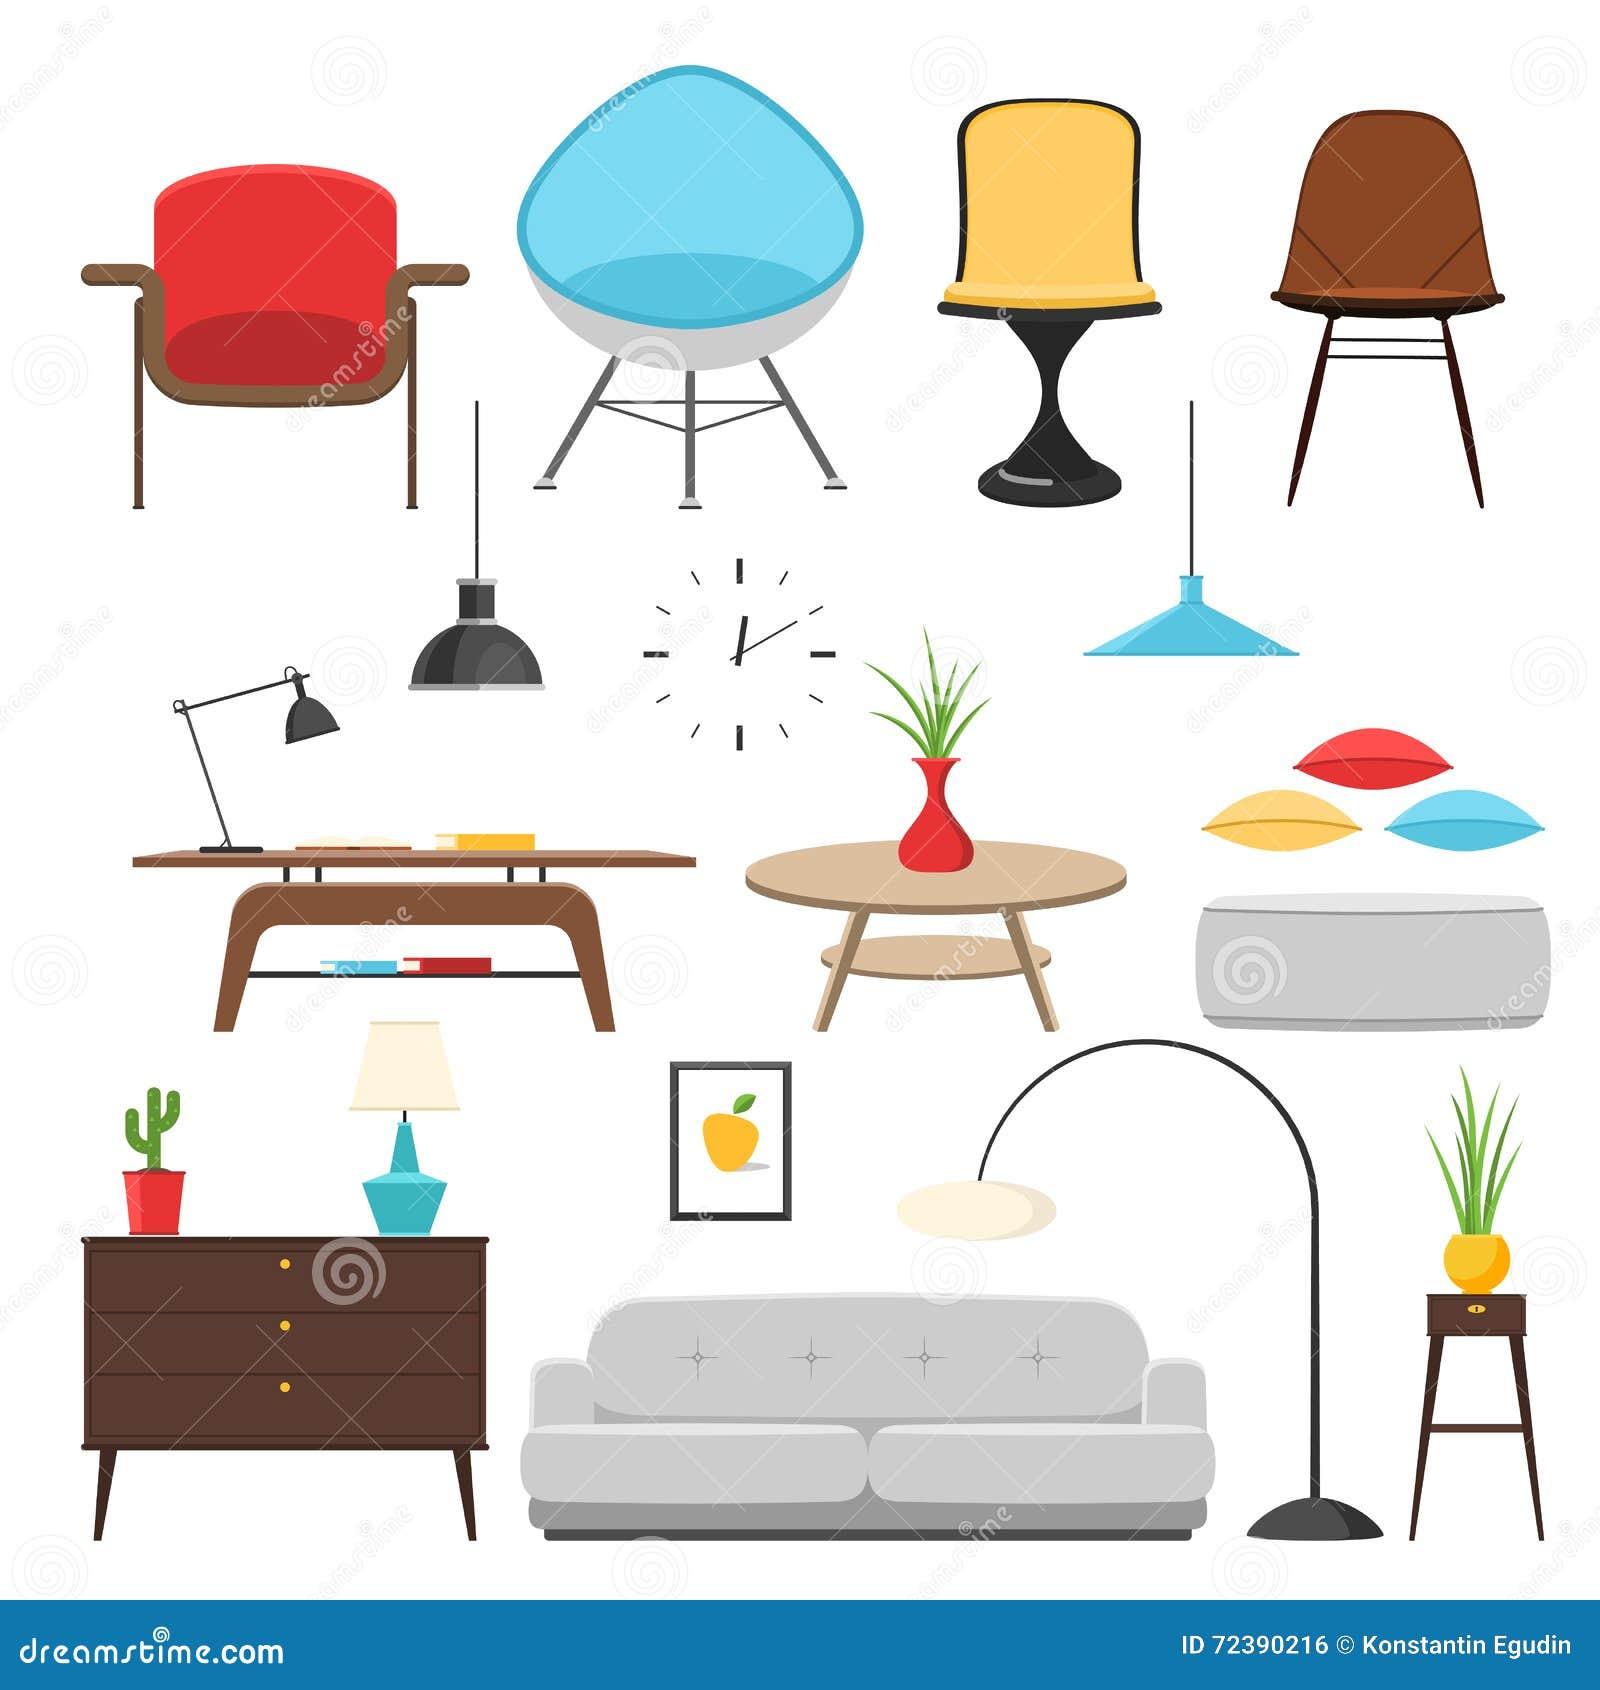 Furniture Interior Icon Set Stock Vector Illustration Of Couch Interior 72390216